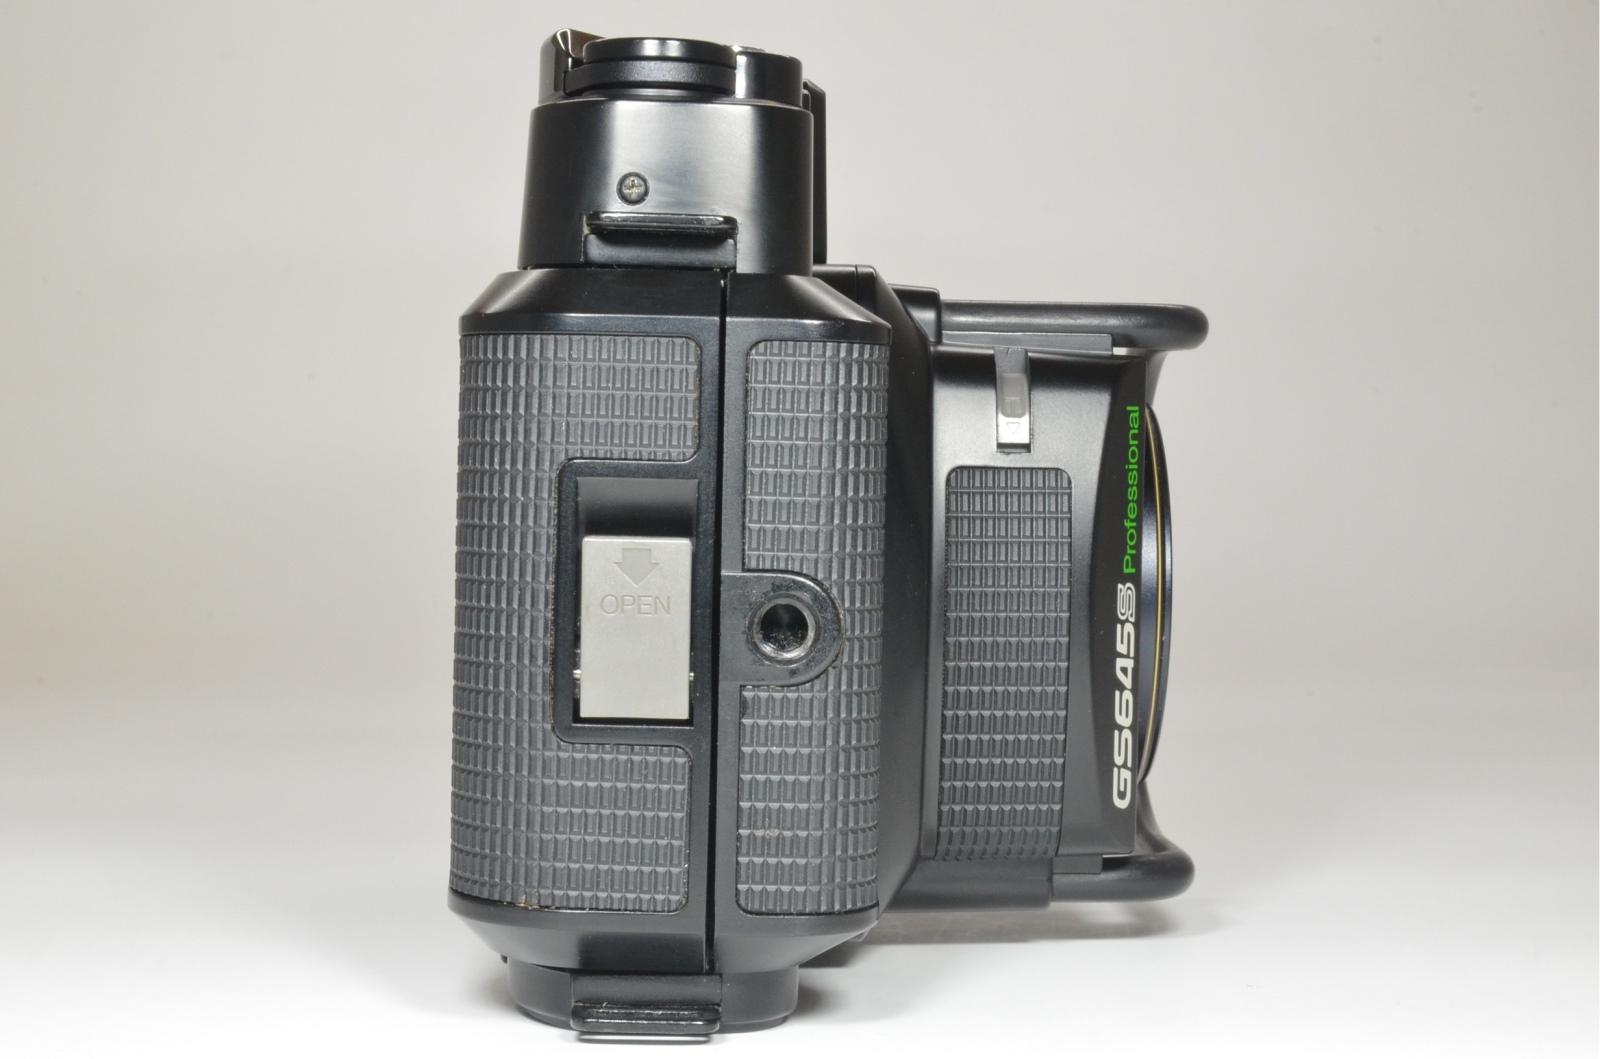 fuji fujifilm gs645s fujinon w 60mm f4 camera from japan shooting tested